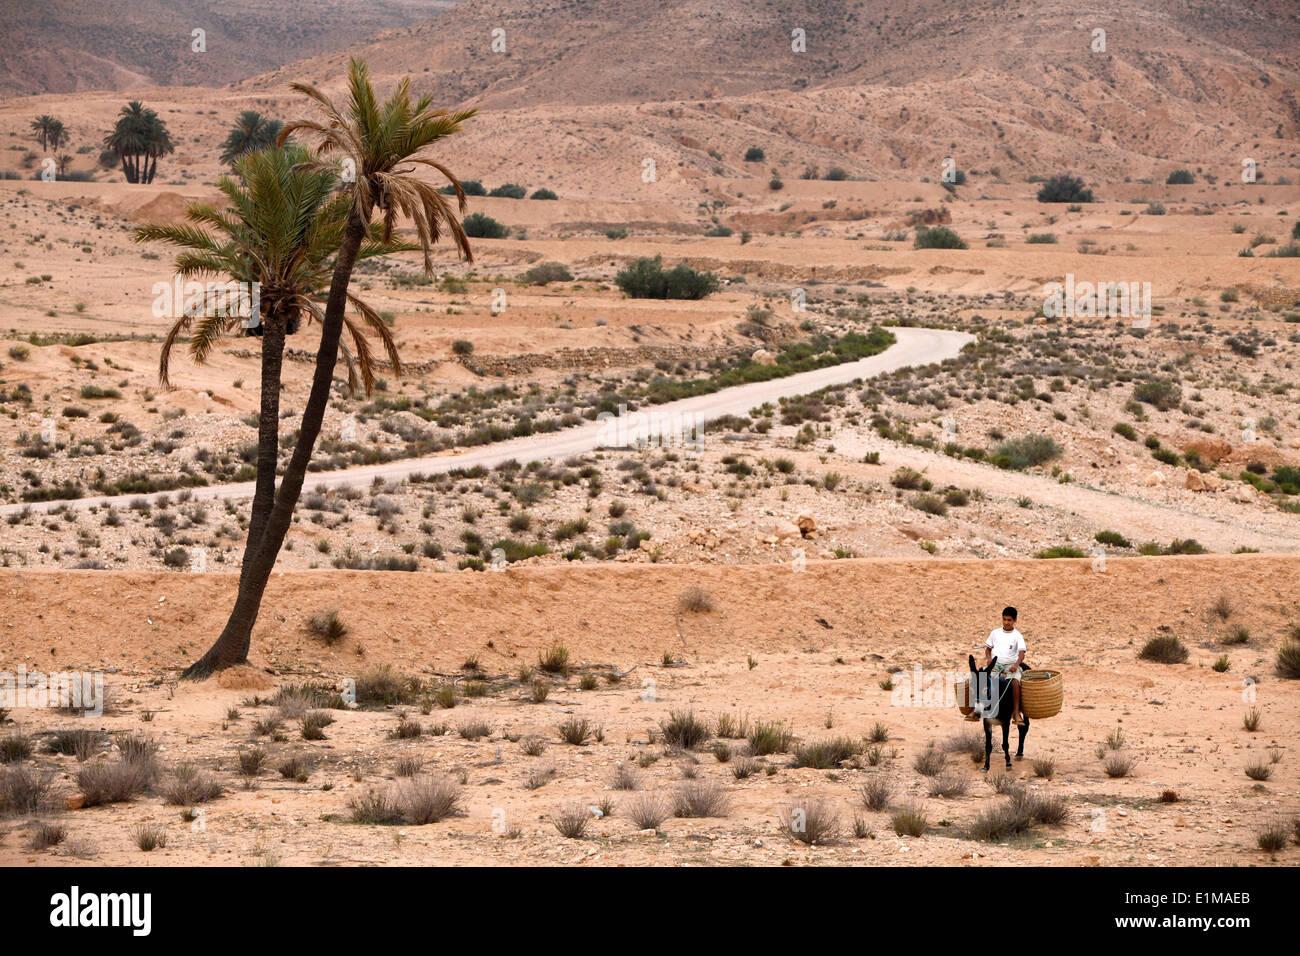 Boy on a donkey in a parched landscape - Stock Image